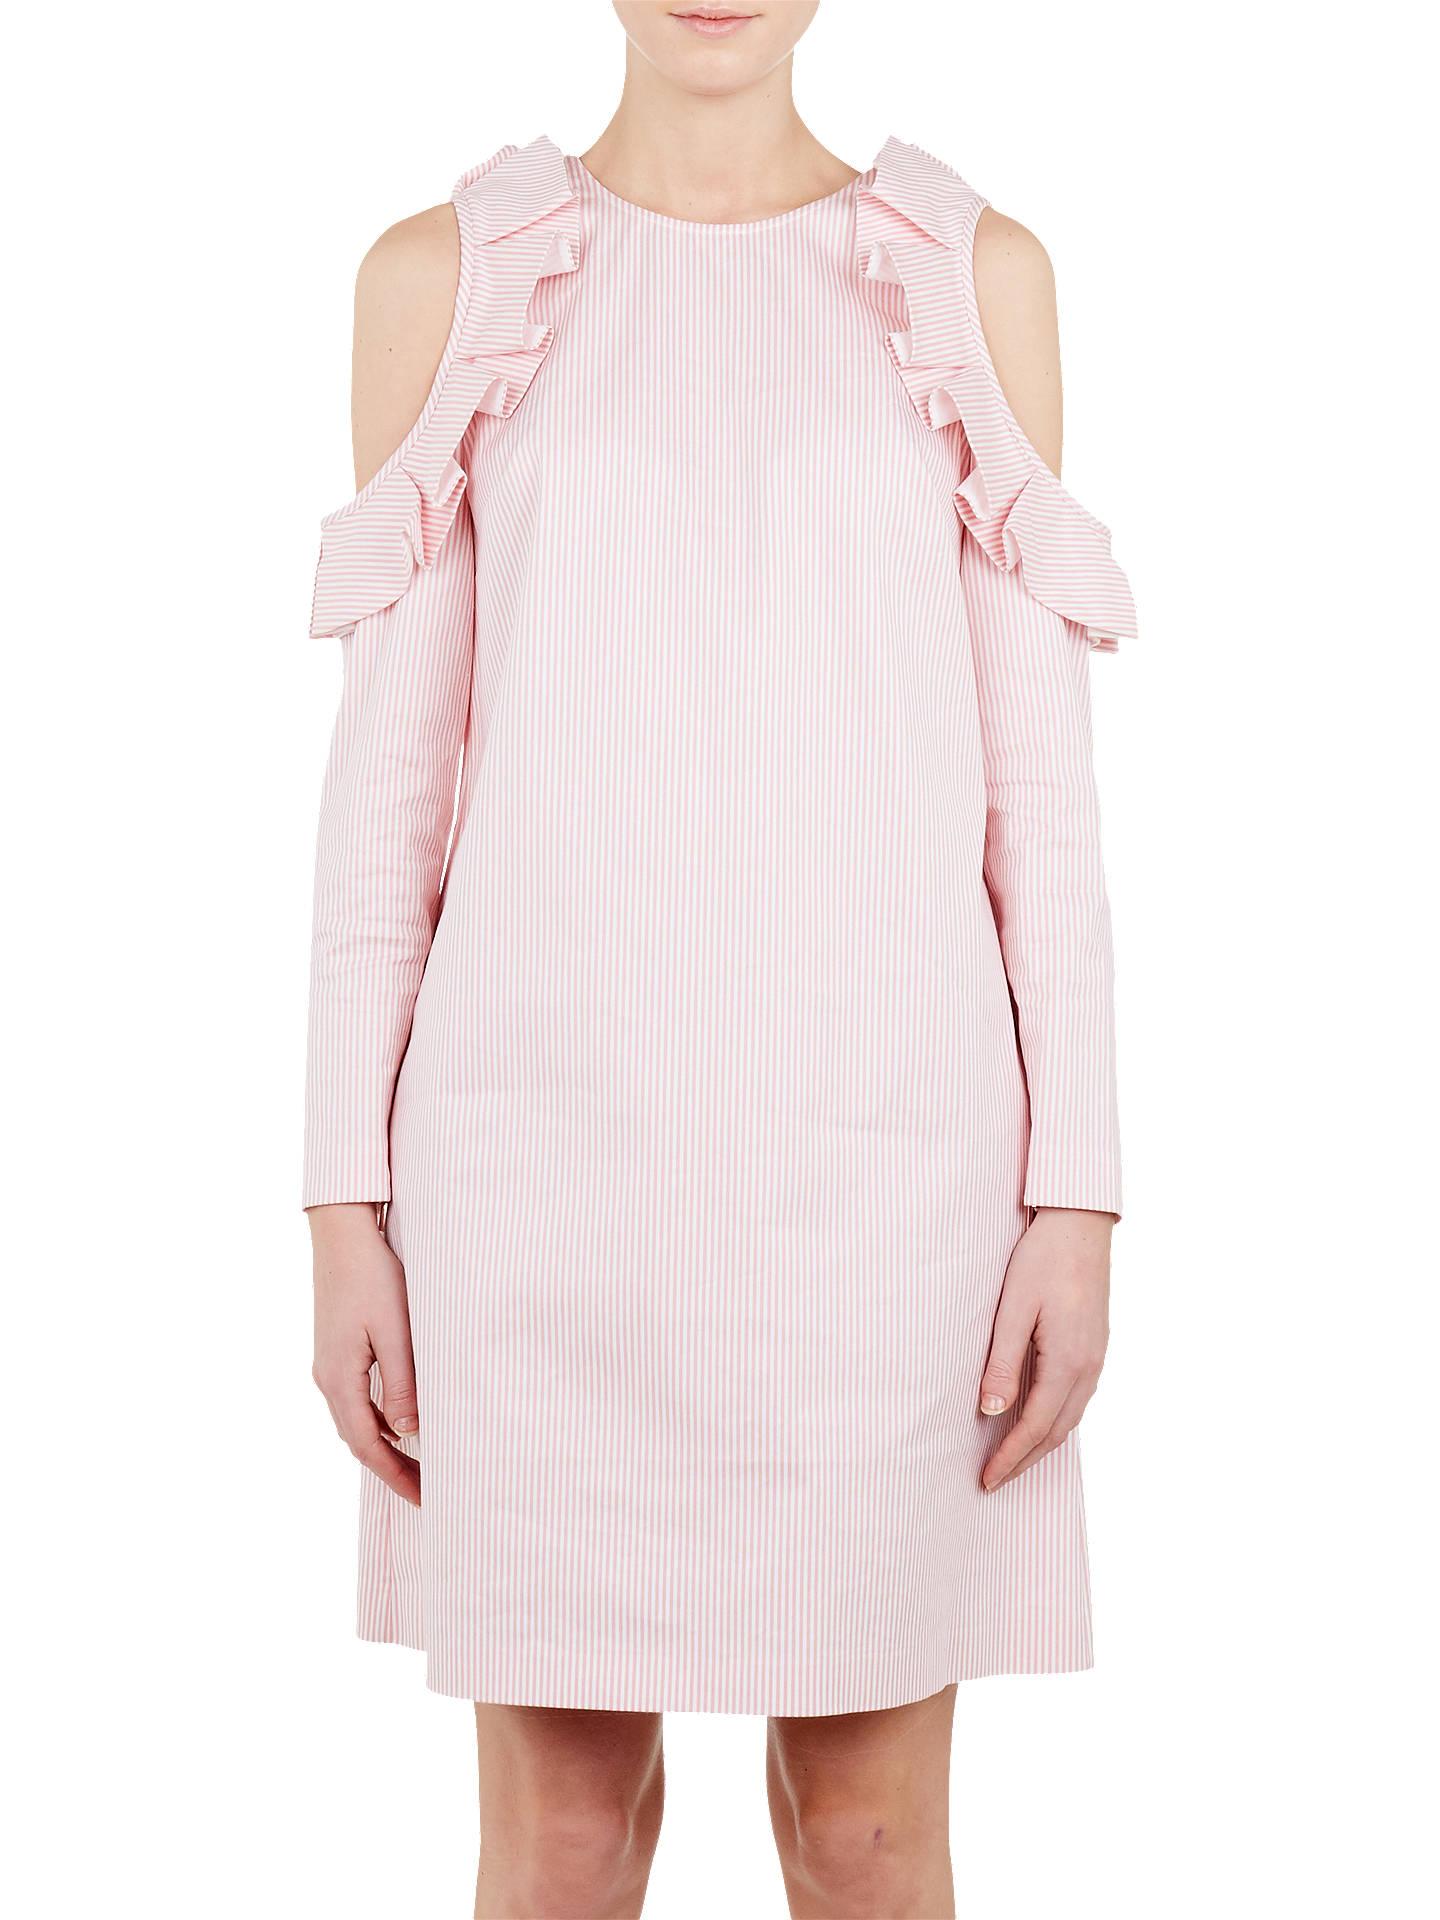 056988b80d7 Buy Ted Baker Stripe Cold Shoulder Tunic Dress, White/Pink, 0 Online at ...